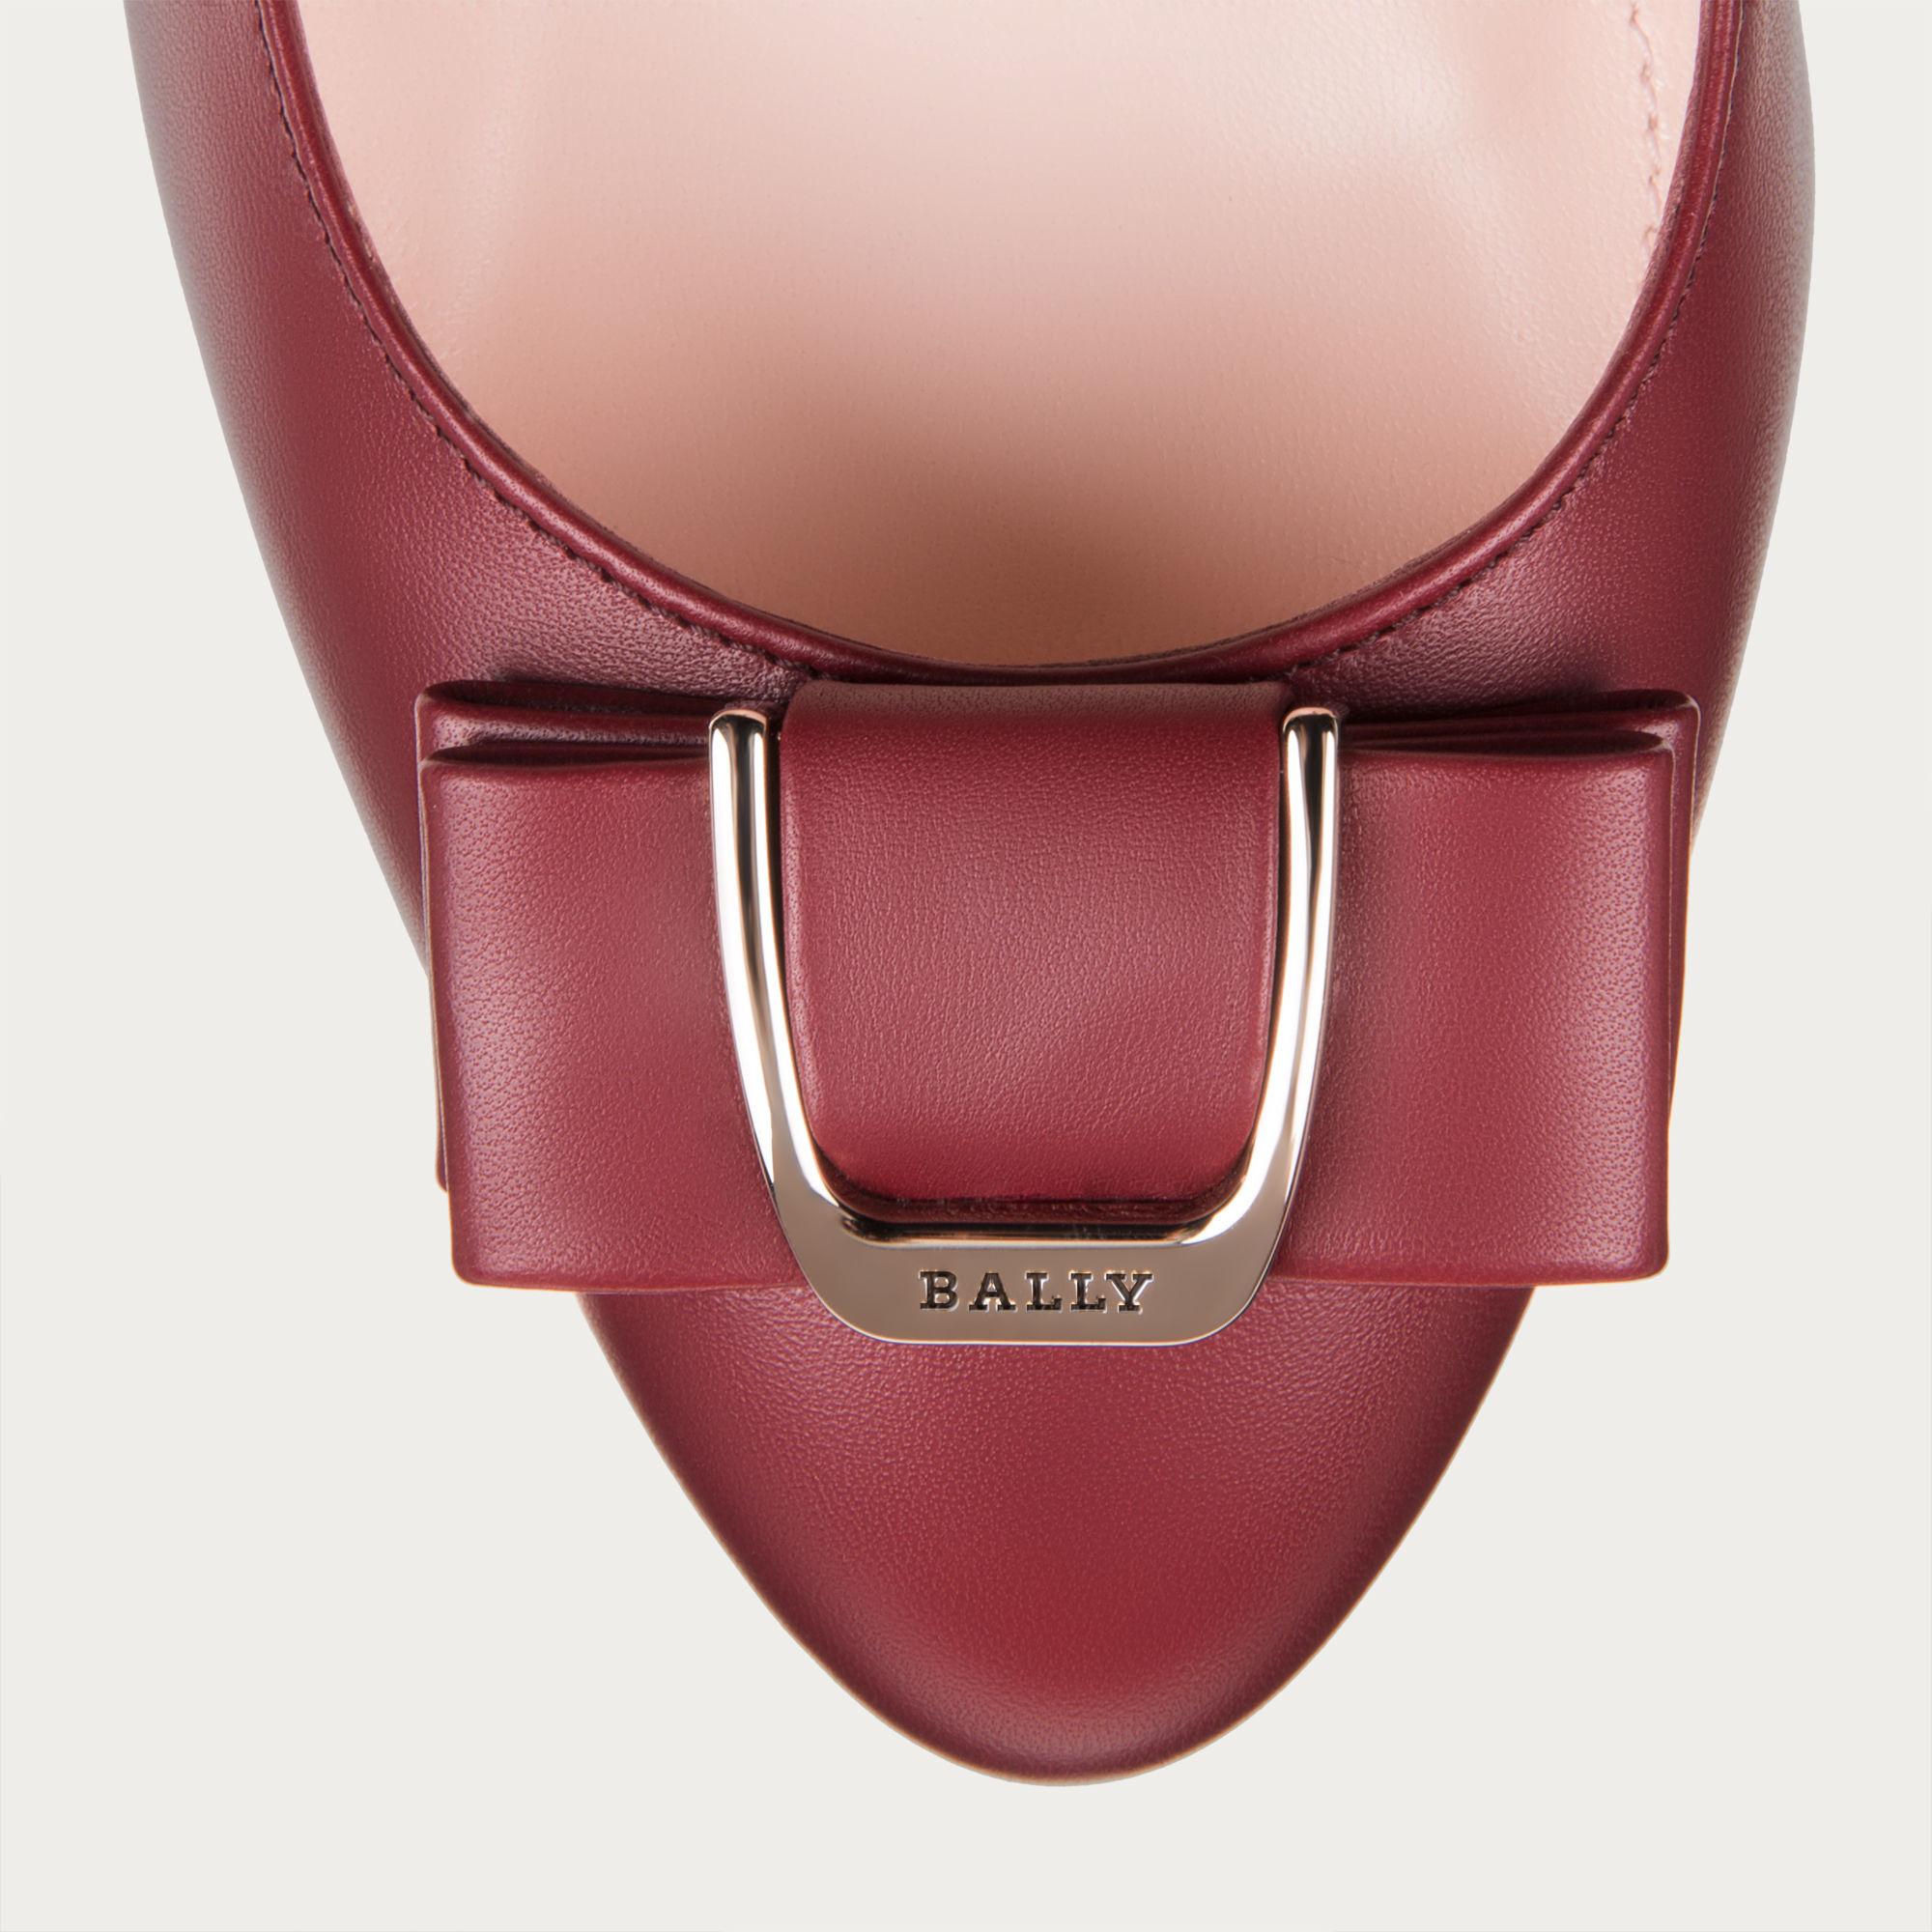 a8e2abf78013 Lyst - Bally Bellyna Women ́s Leather Pump In Dark Red in Purple